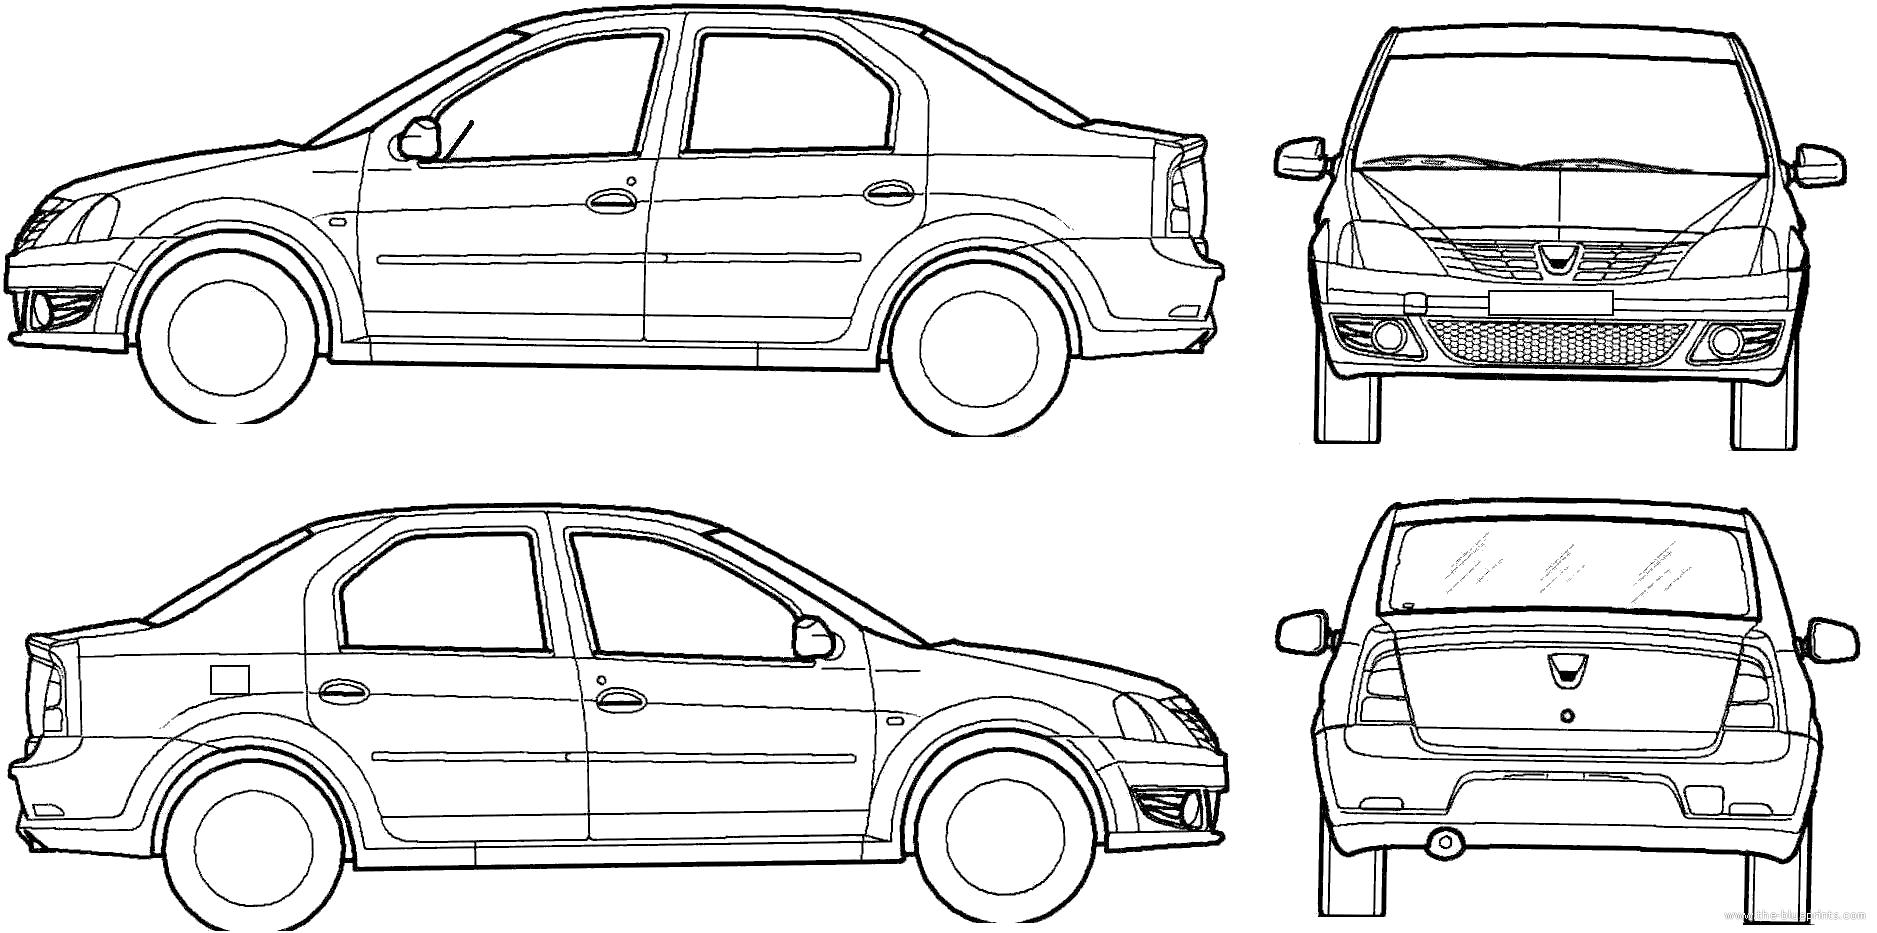 Blueprints > Cars > Dacia > Dacia Logan (2007)